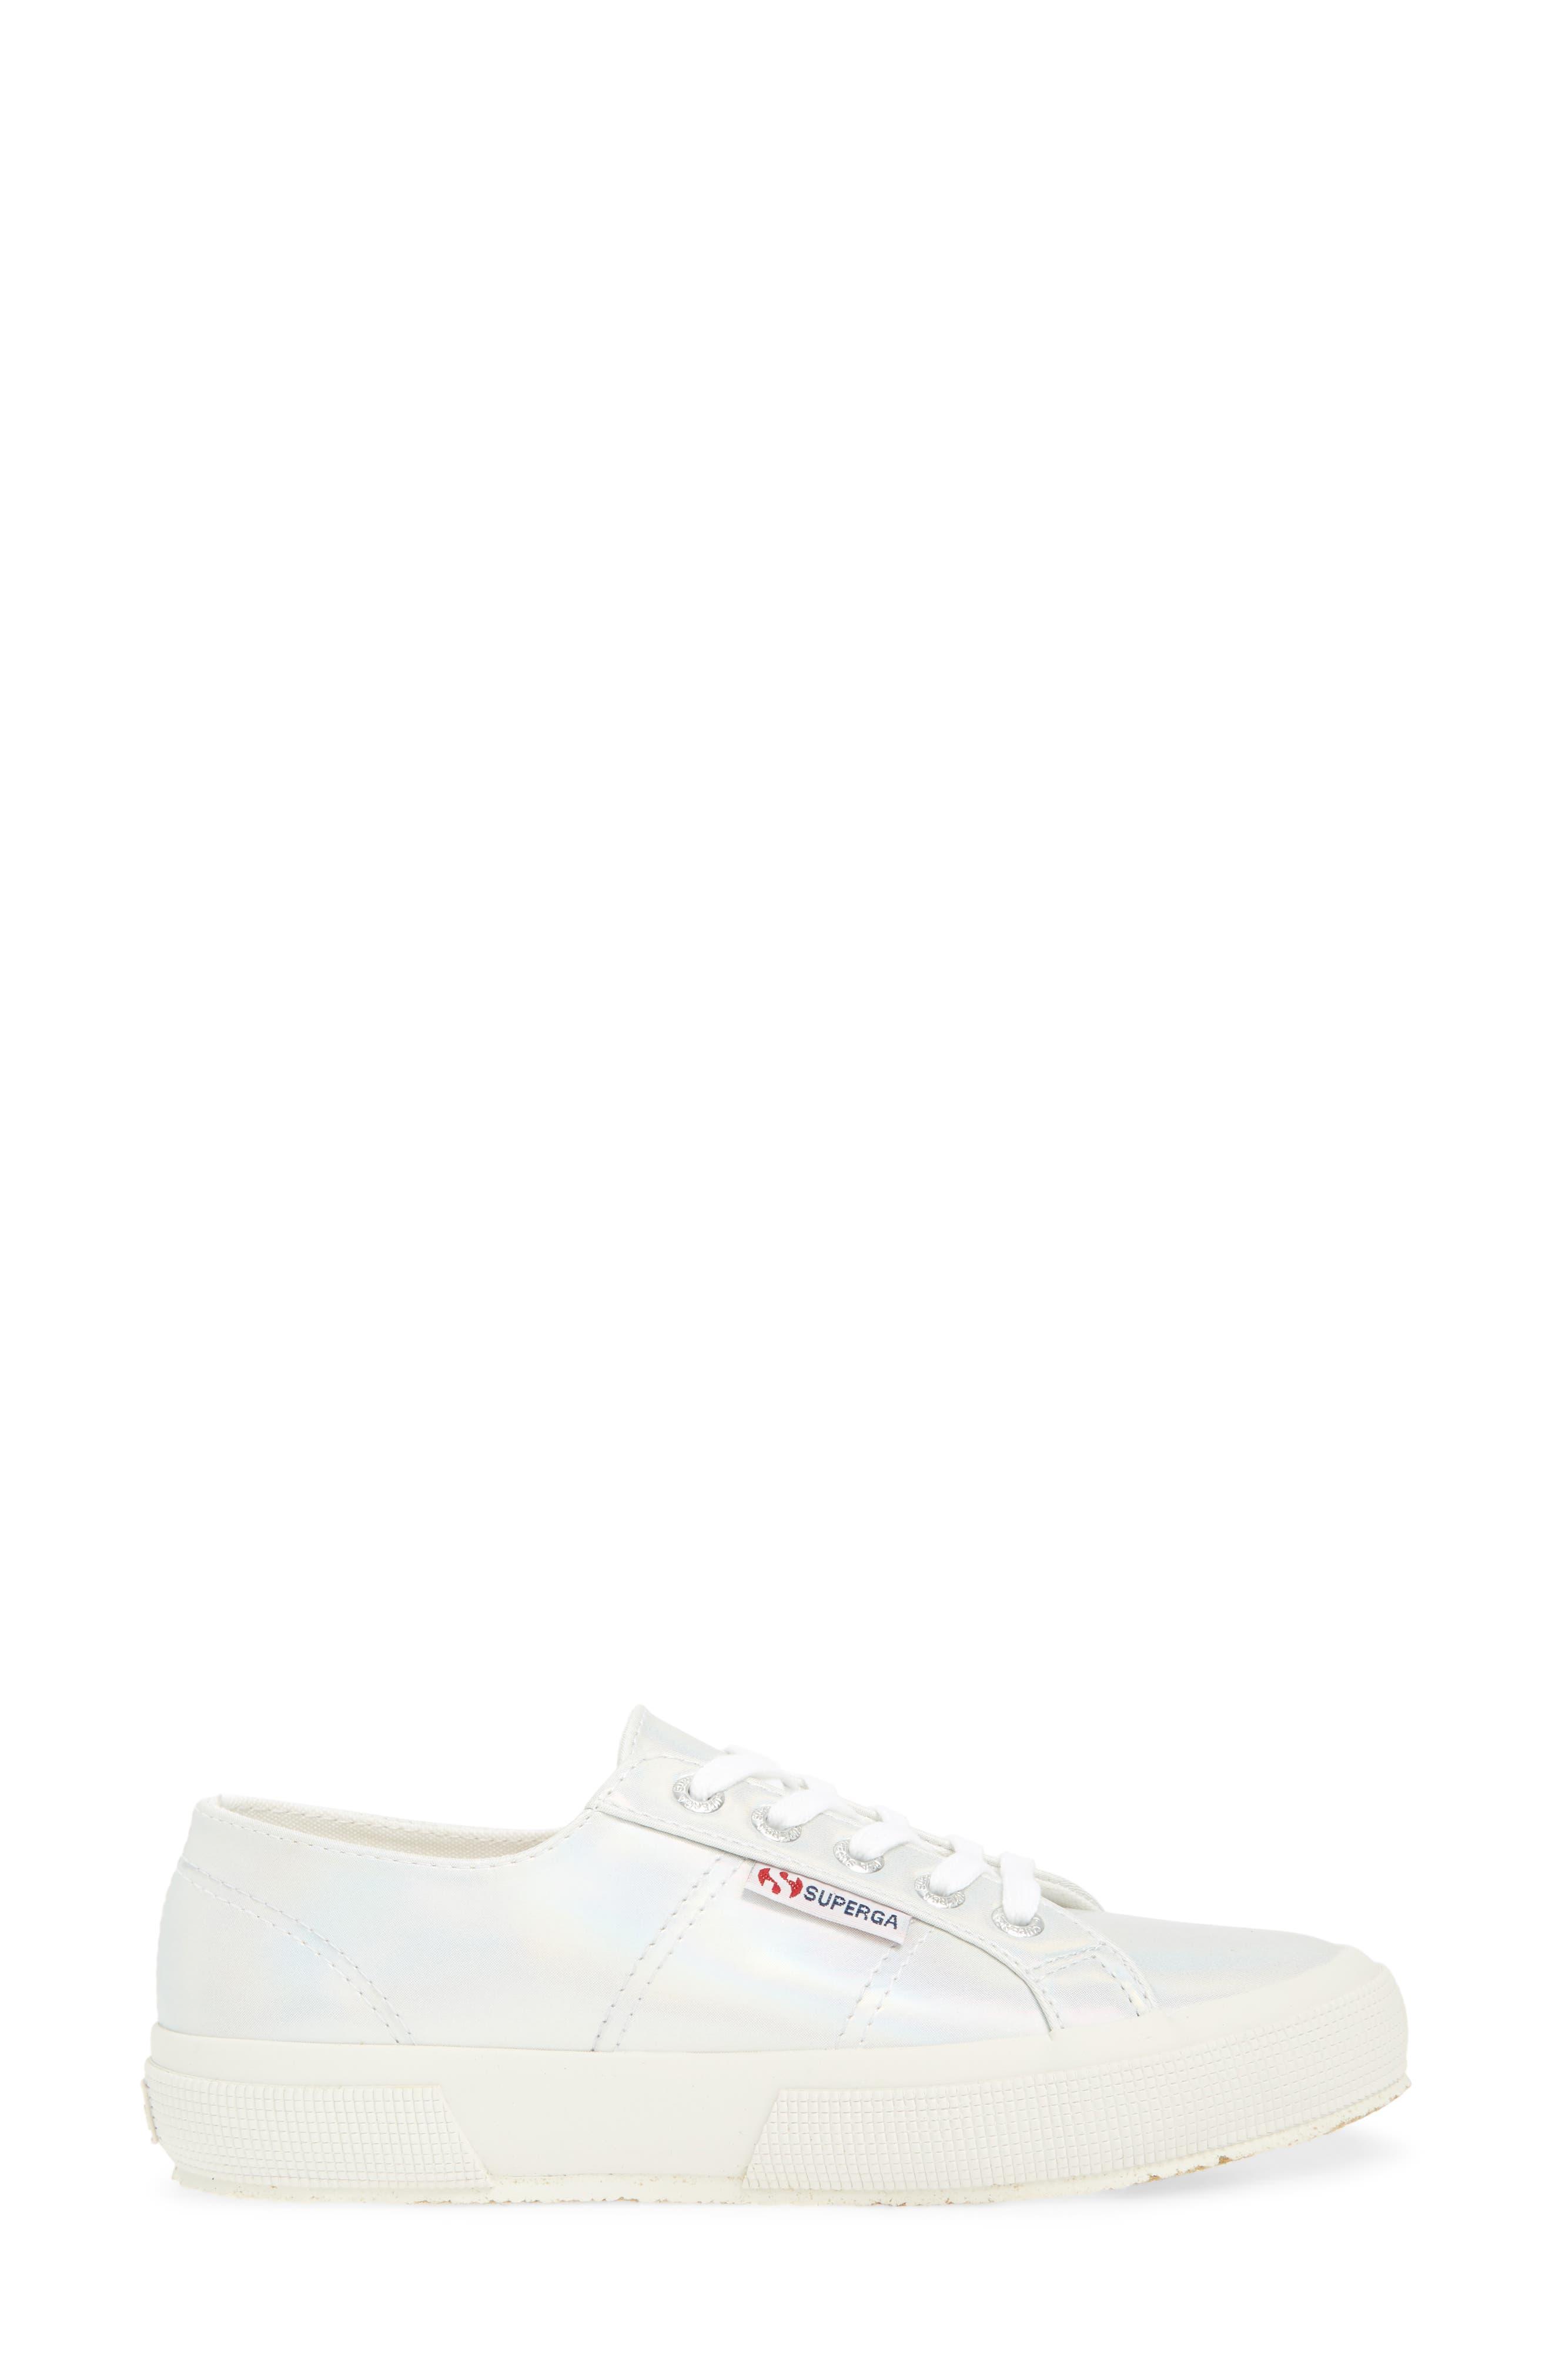 2750 Hologramw Low Top Sneaker,                             Alternate thumbnail 3, color,